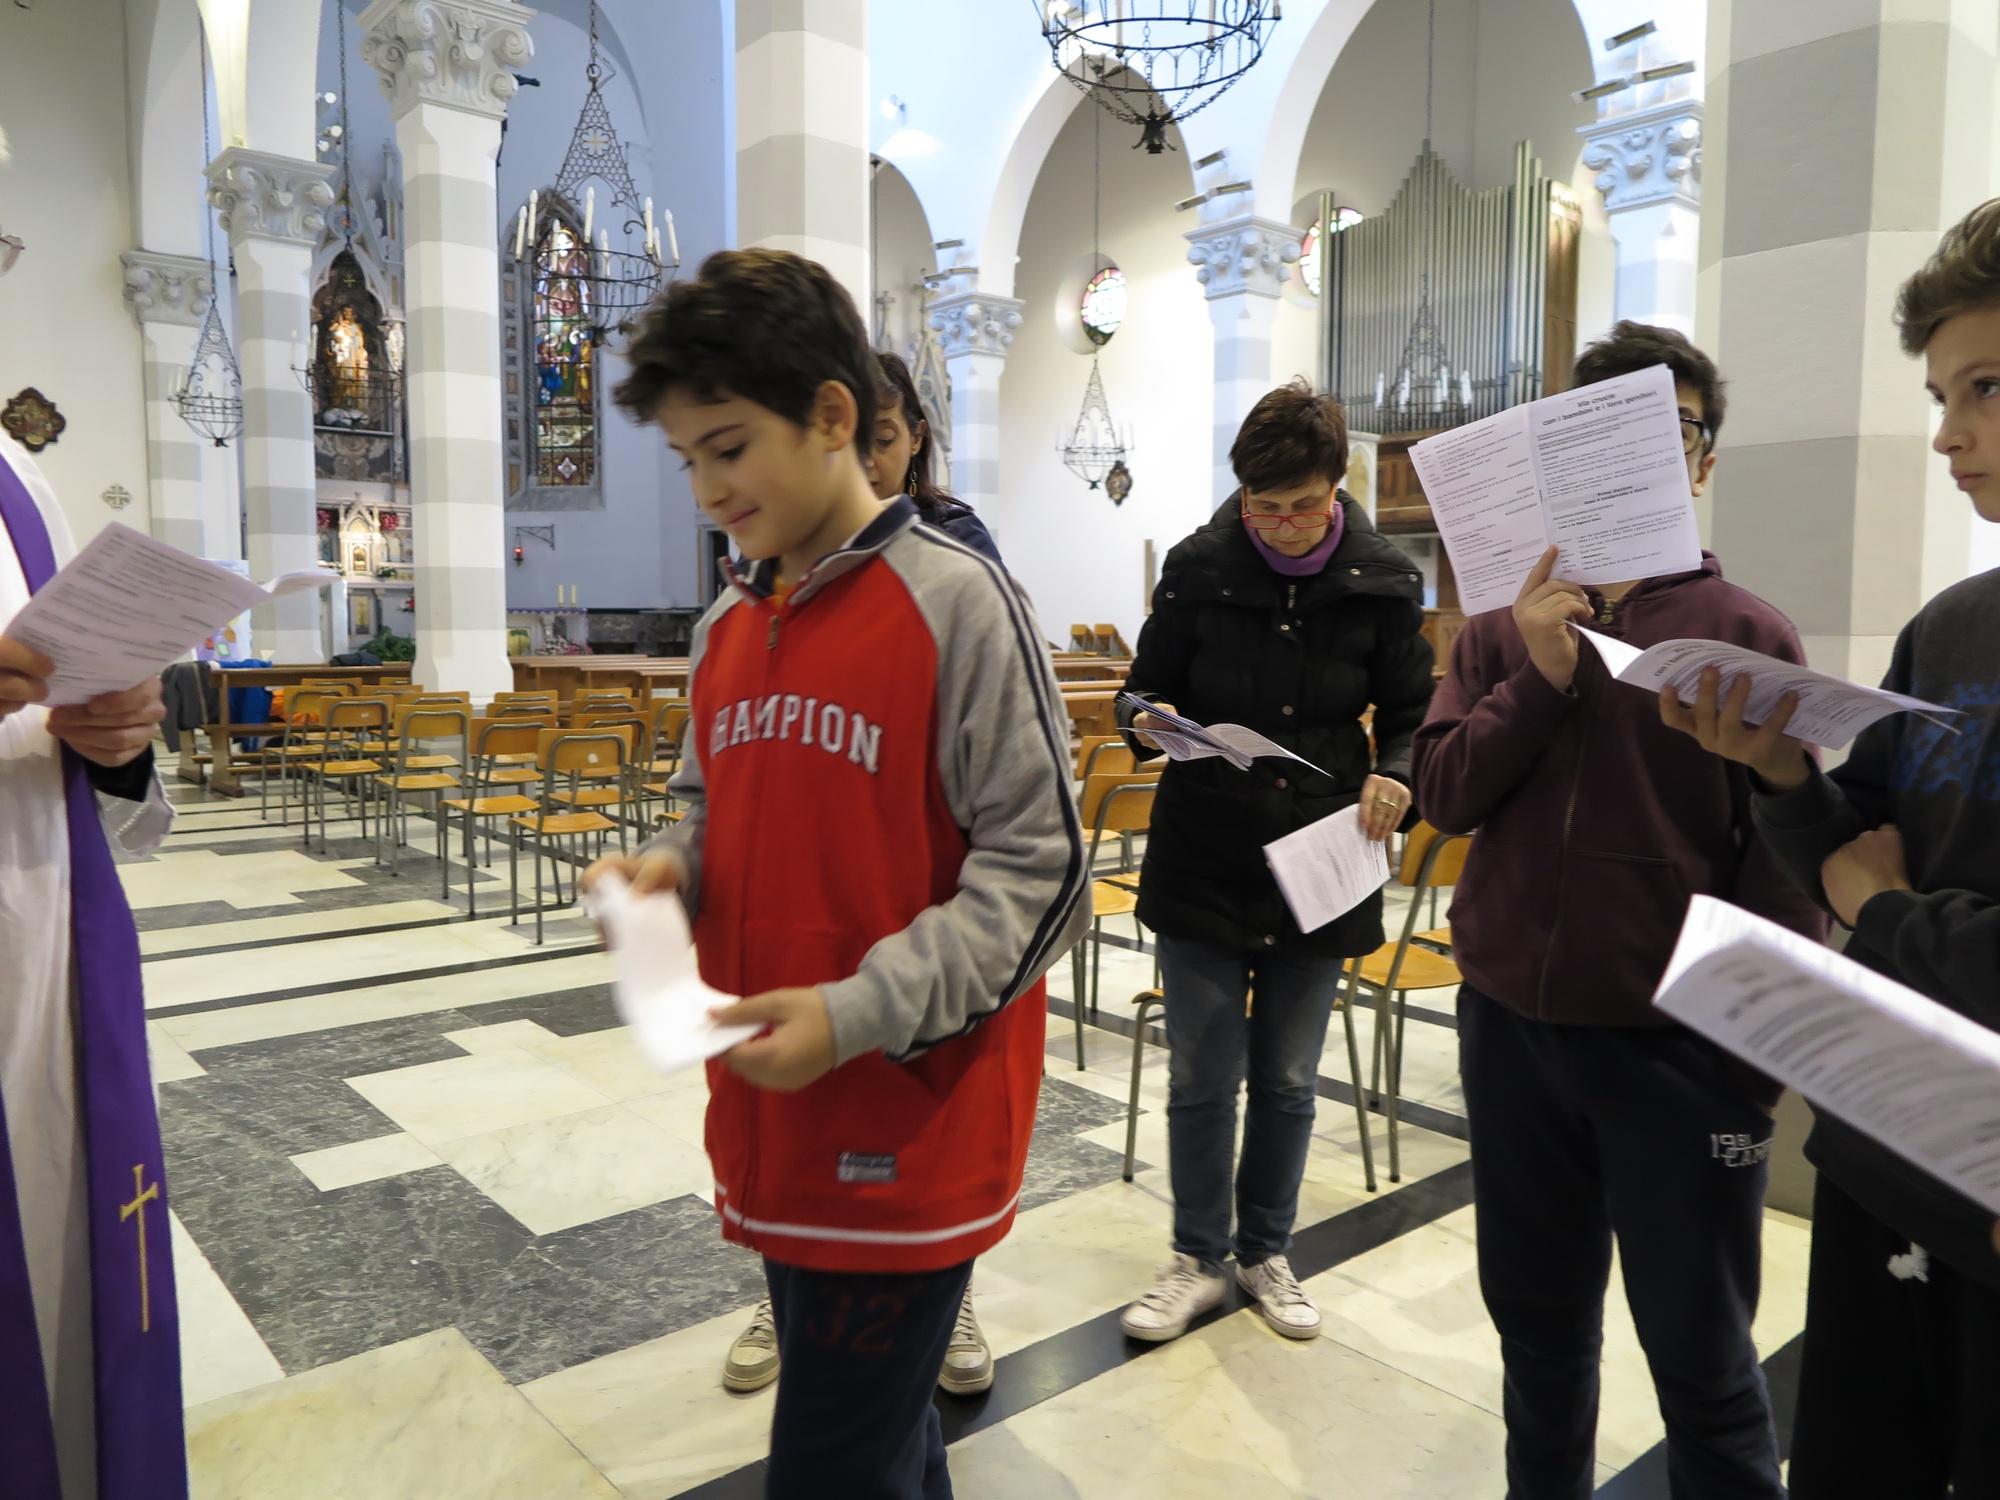 via-crucis-catechismo-2016-03-18-15-23-32